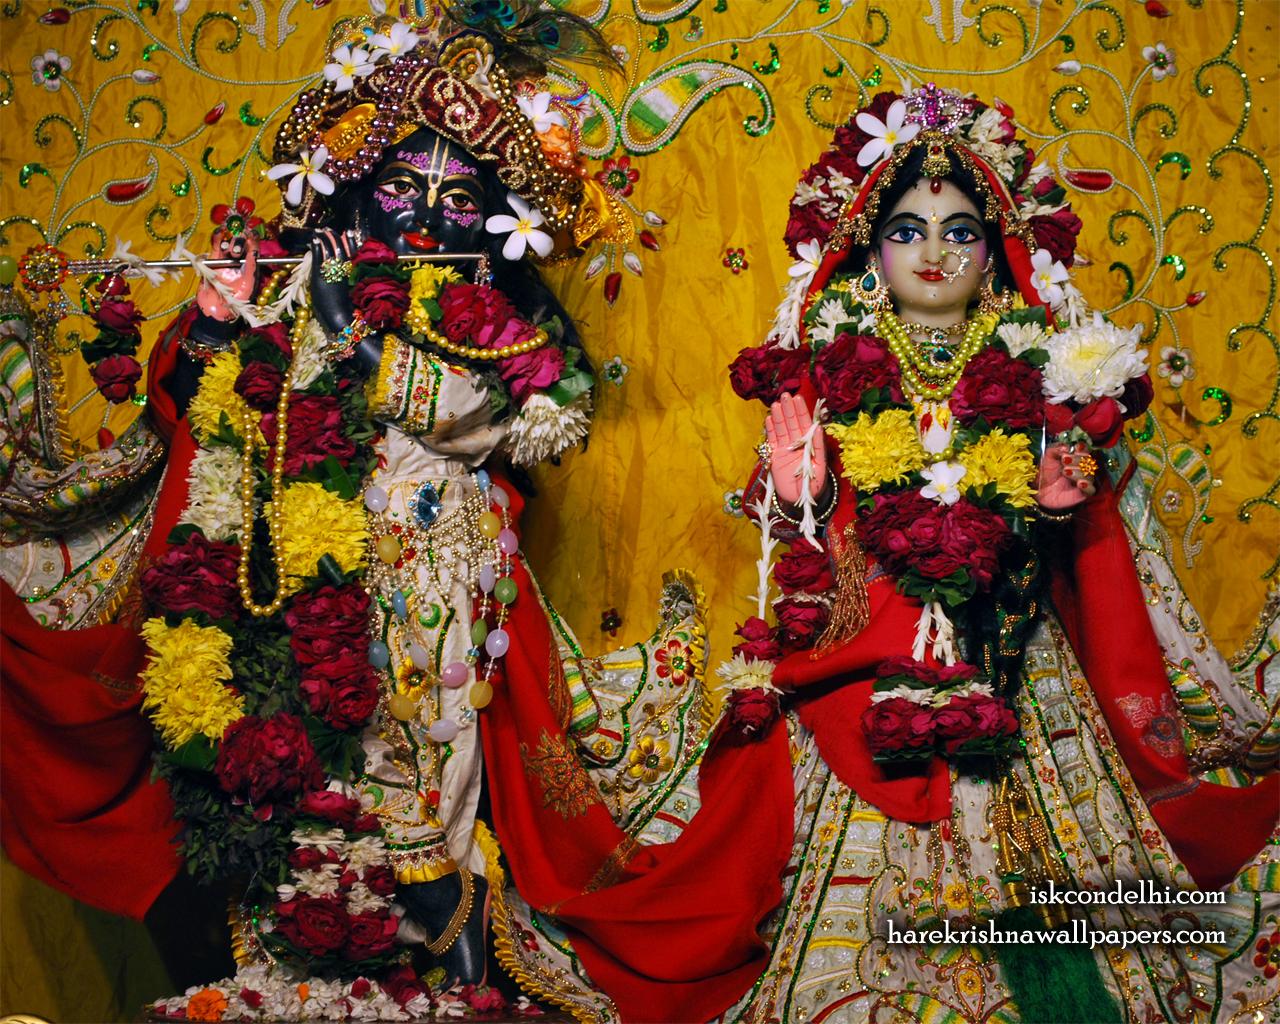 Sri Sri Radha Parthasarathi Wallpaper (004) Size 1280x1024 Download